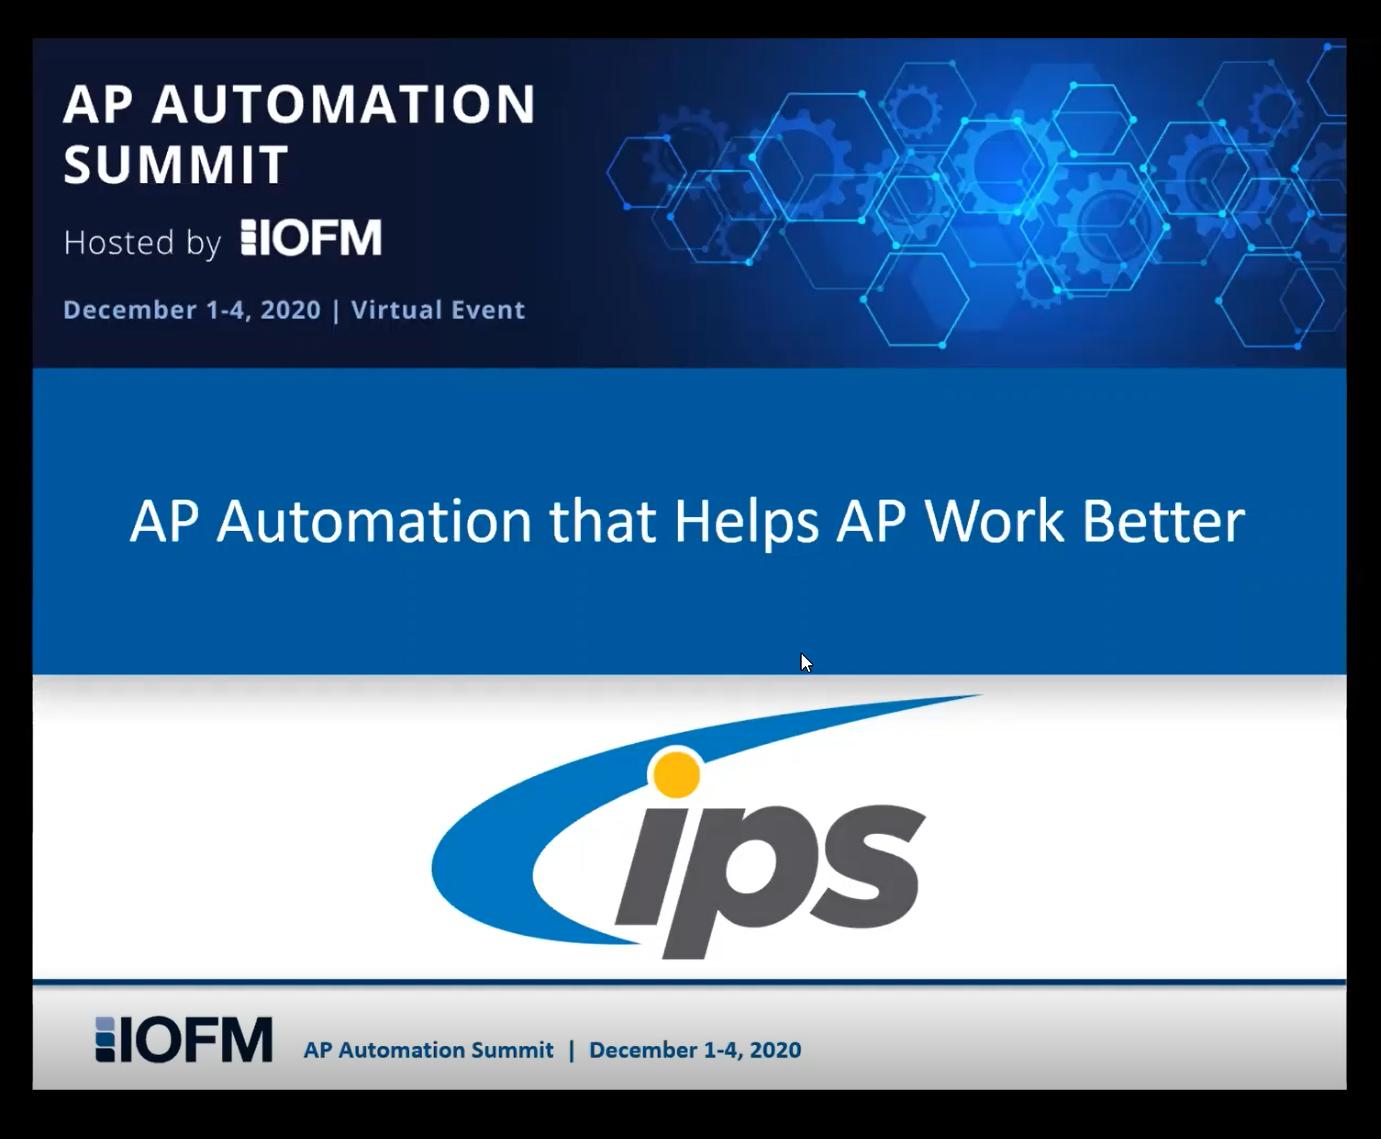 IOFM AP Automation Summit 2020 - IPS Demo: AP Automation